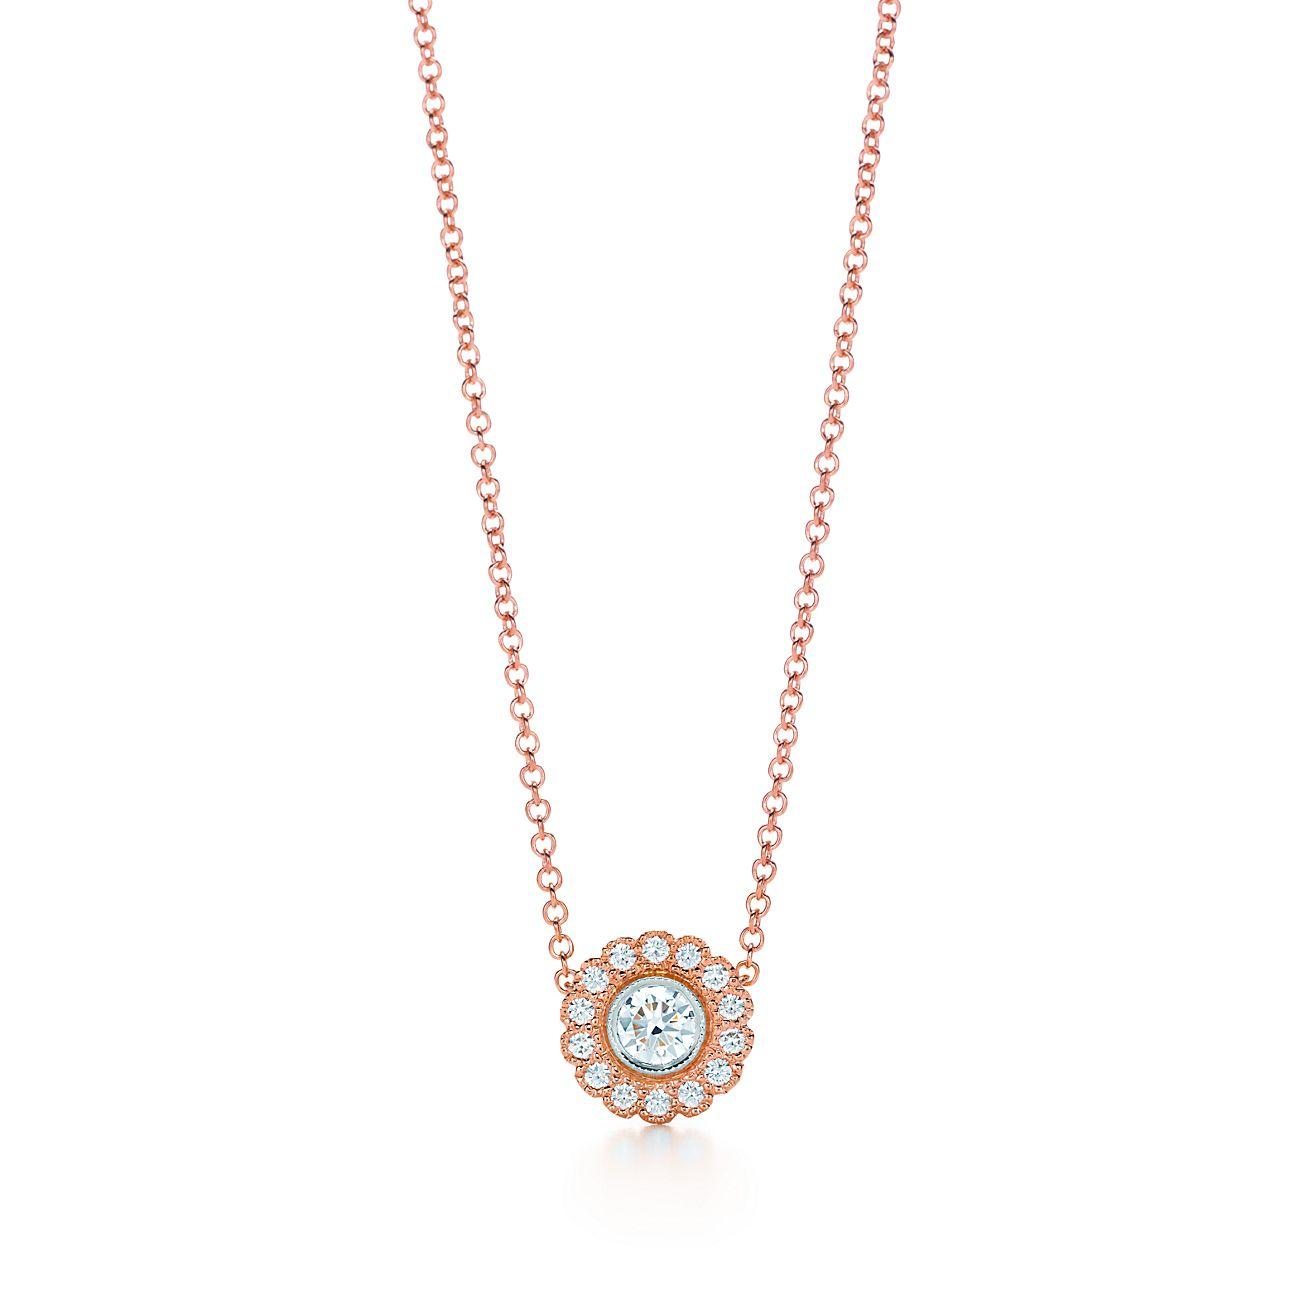 Tiffany & Co. Estate 18k Triple Diamond Necklace